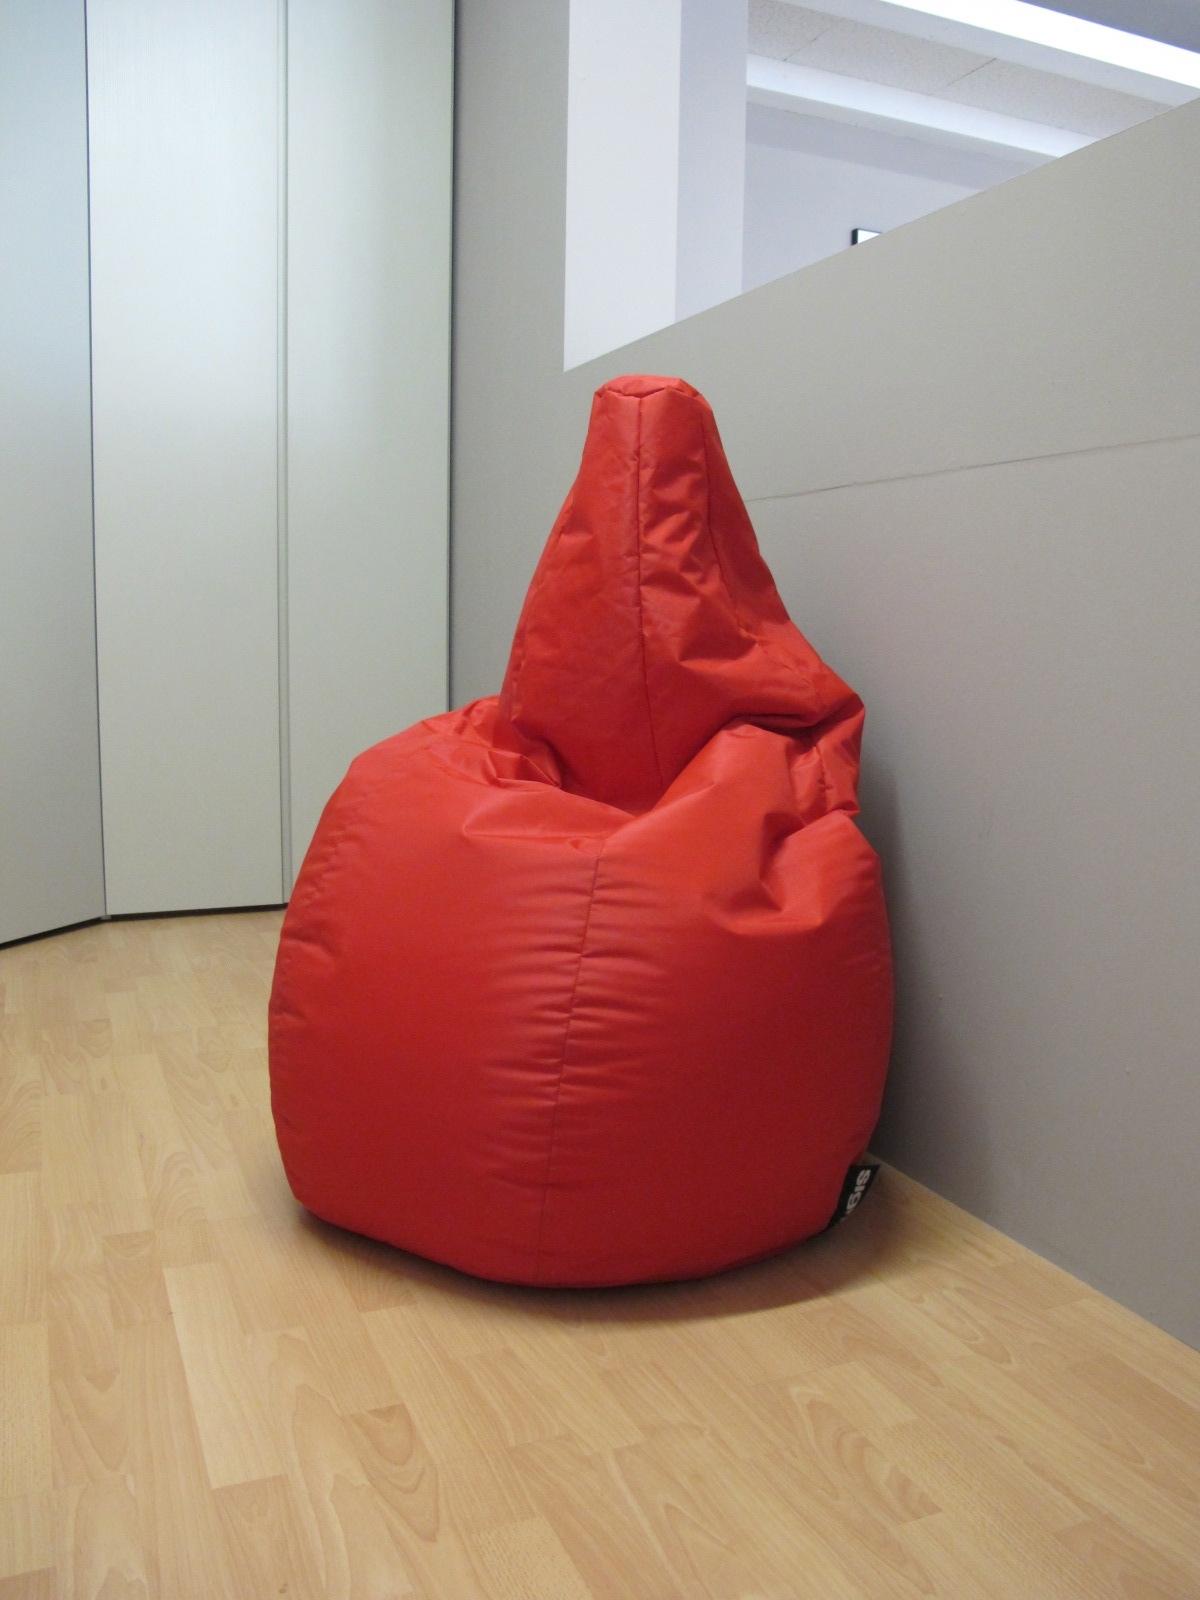 Pouf poltrona sacco sedie a prezzi scontati - Sacco poltrona ikea ...